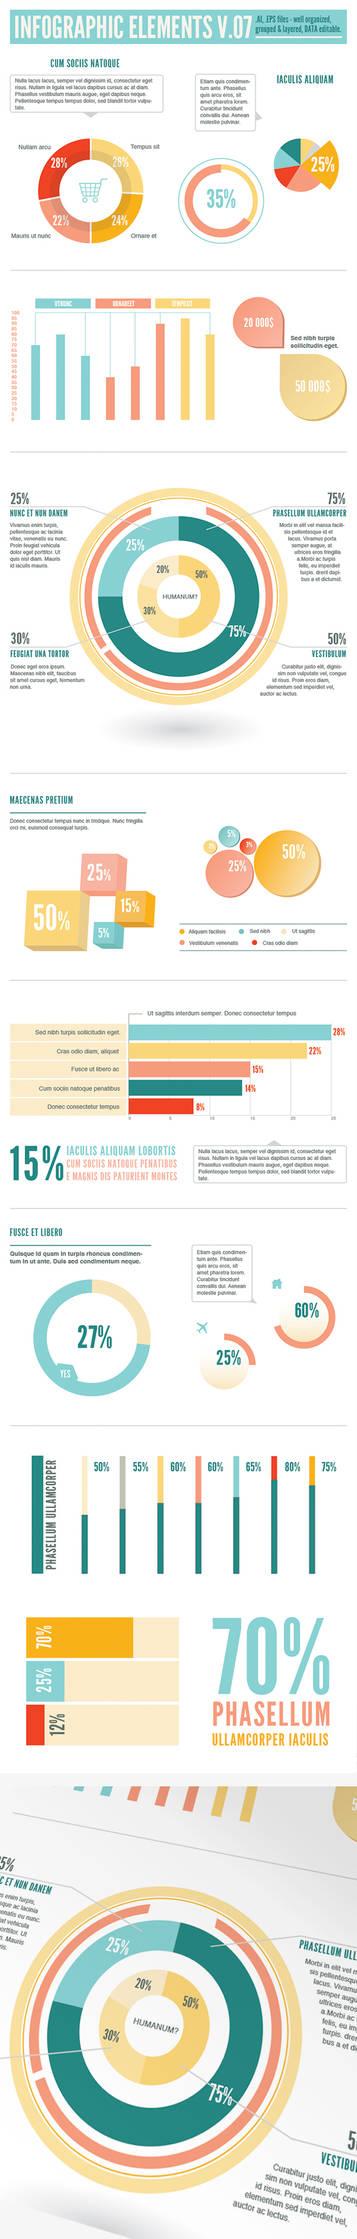 infographic elements V.07